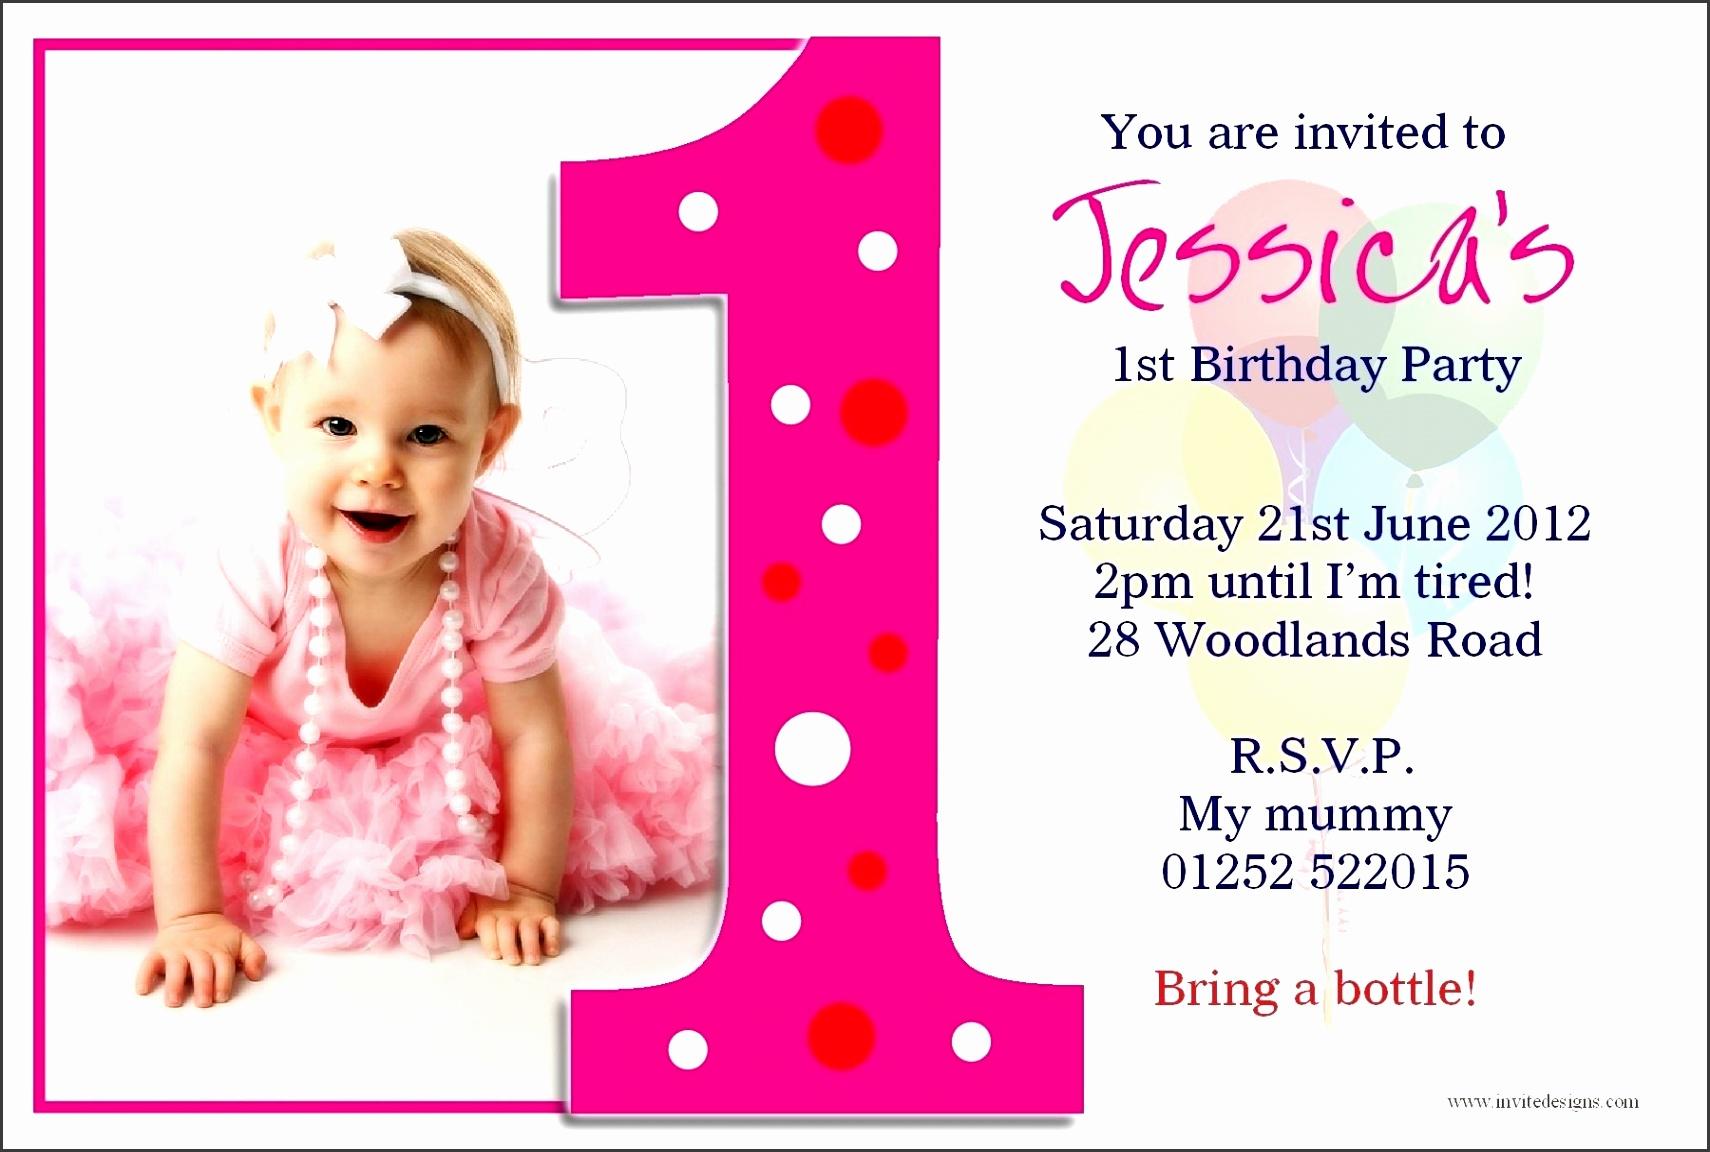 1St Birthday Invitation Card Template Free Download within 1St Birthday Invitation Card Template 5283